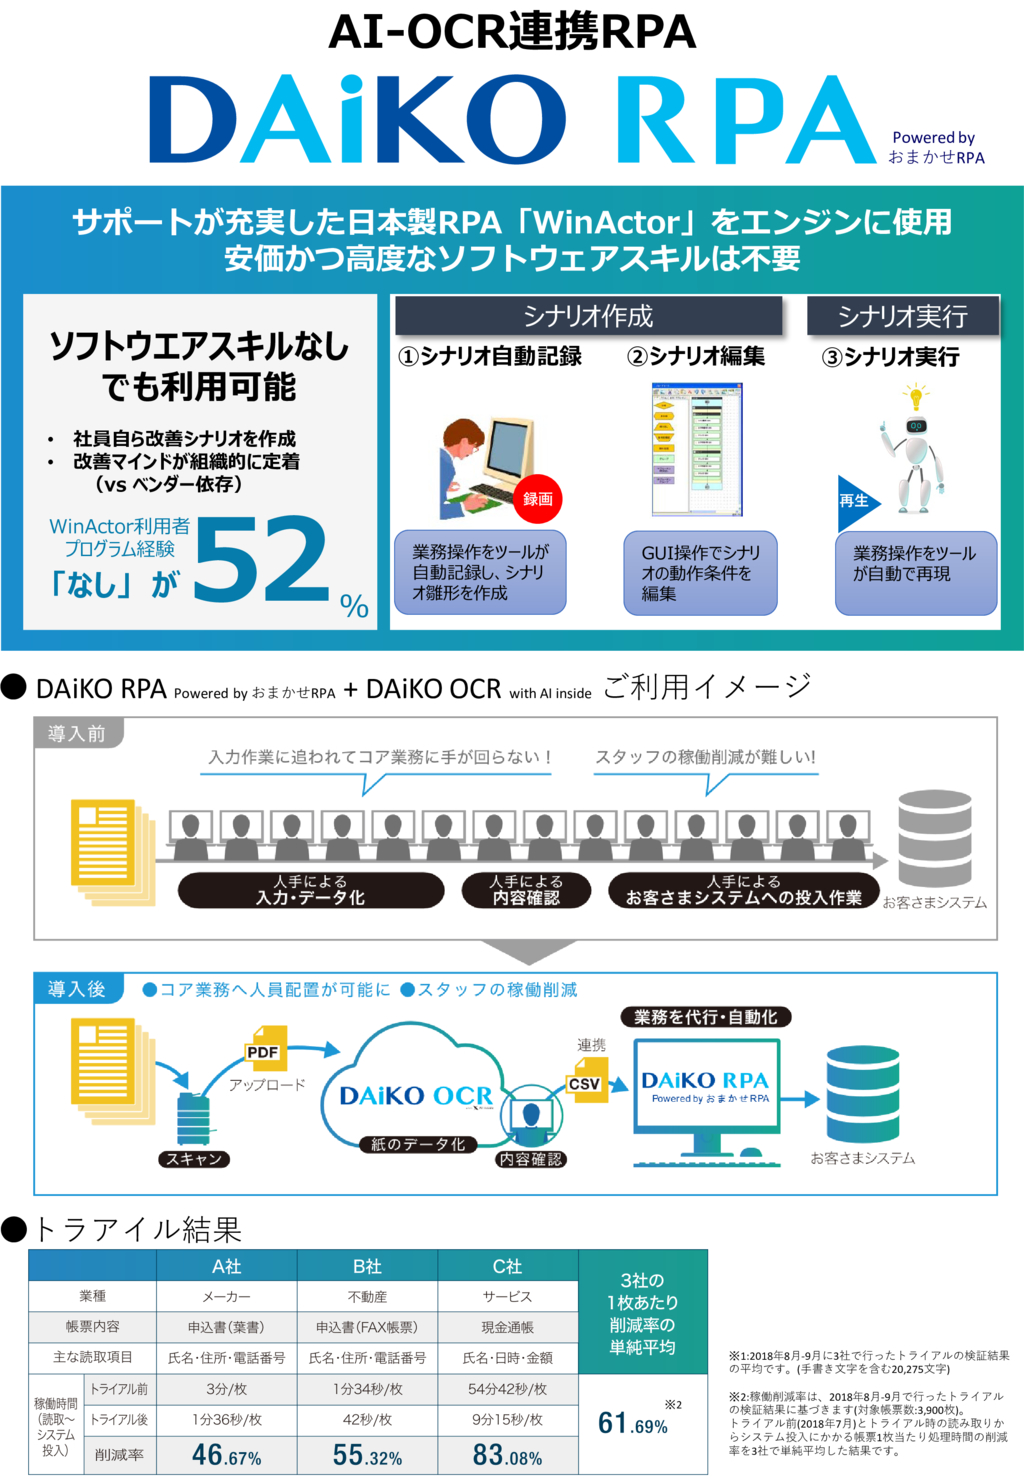 DAiKO RPA Powered by おまかせRPAの資料